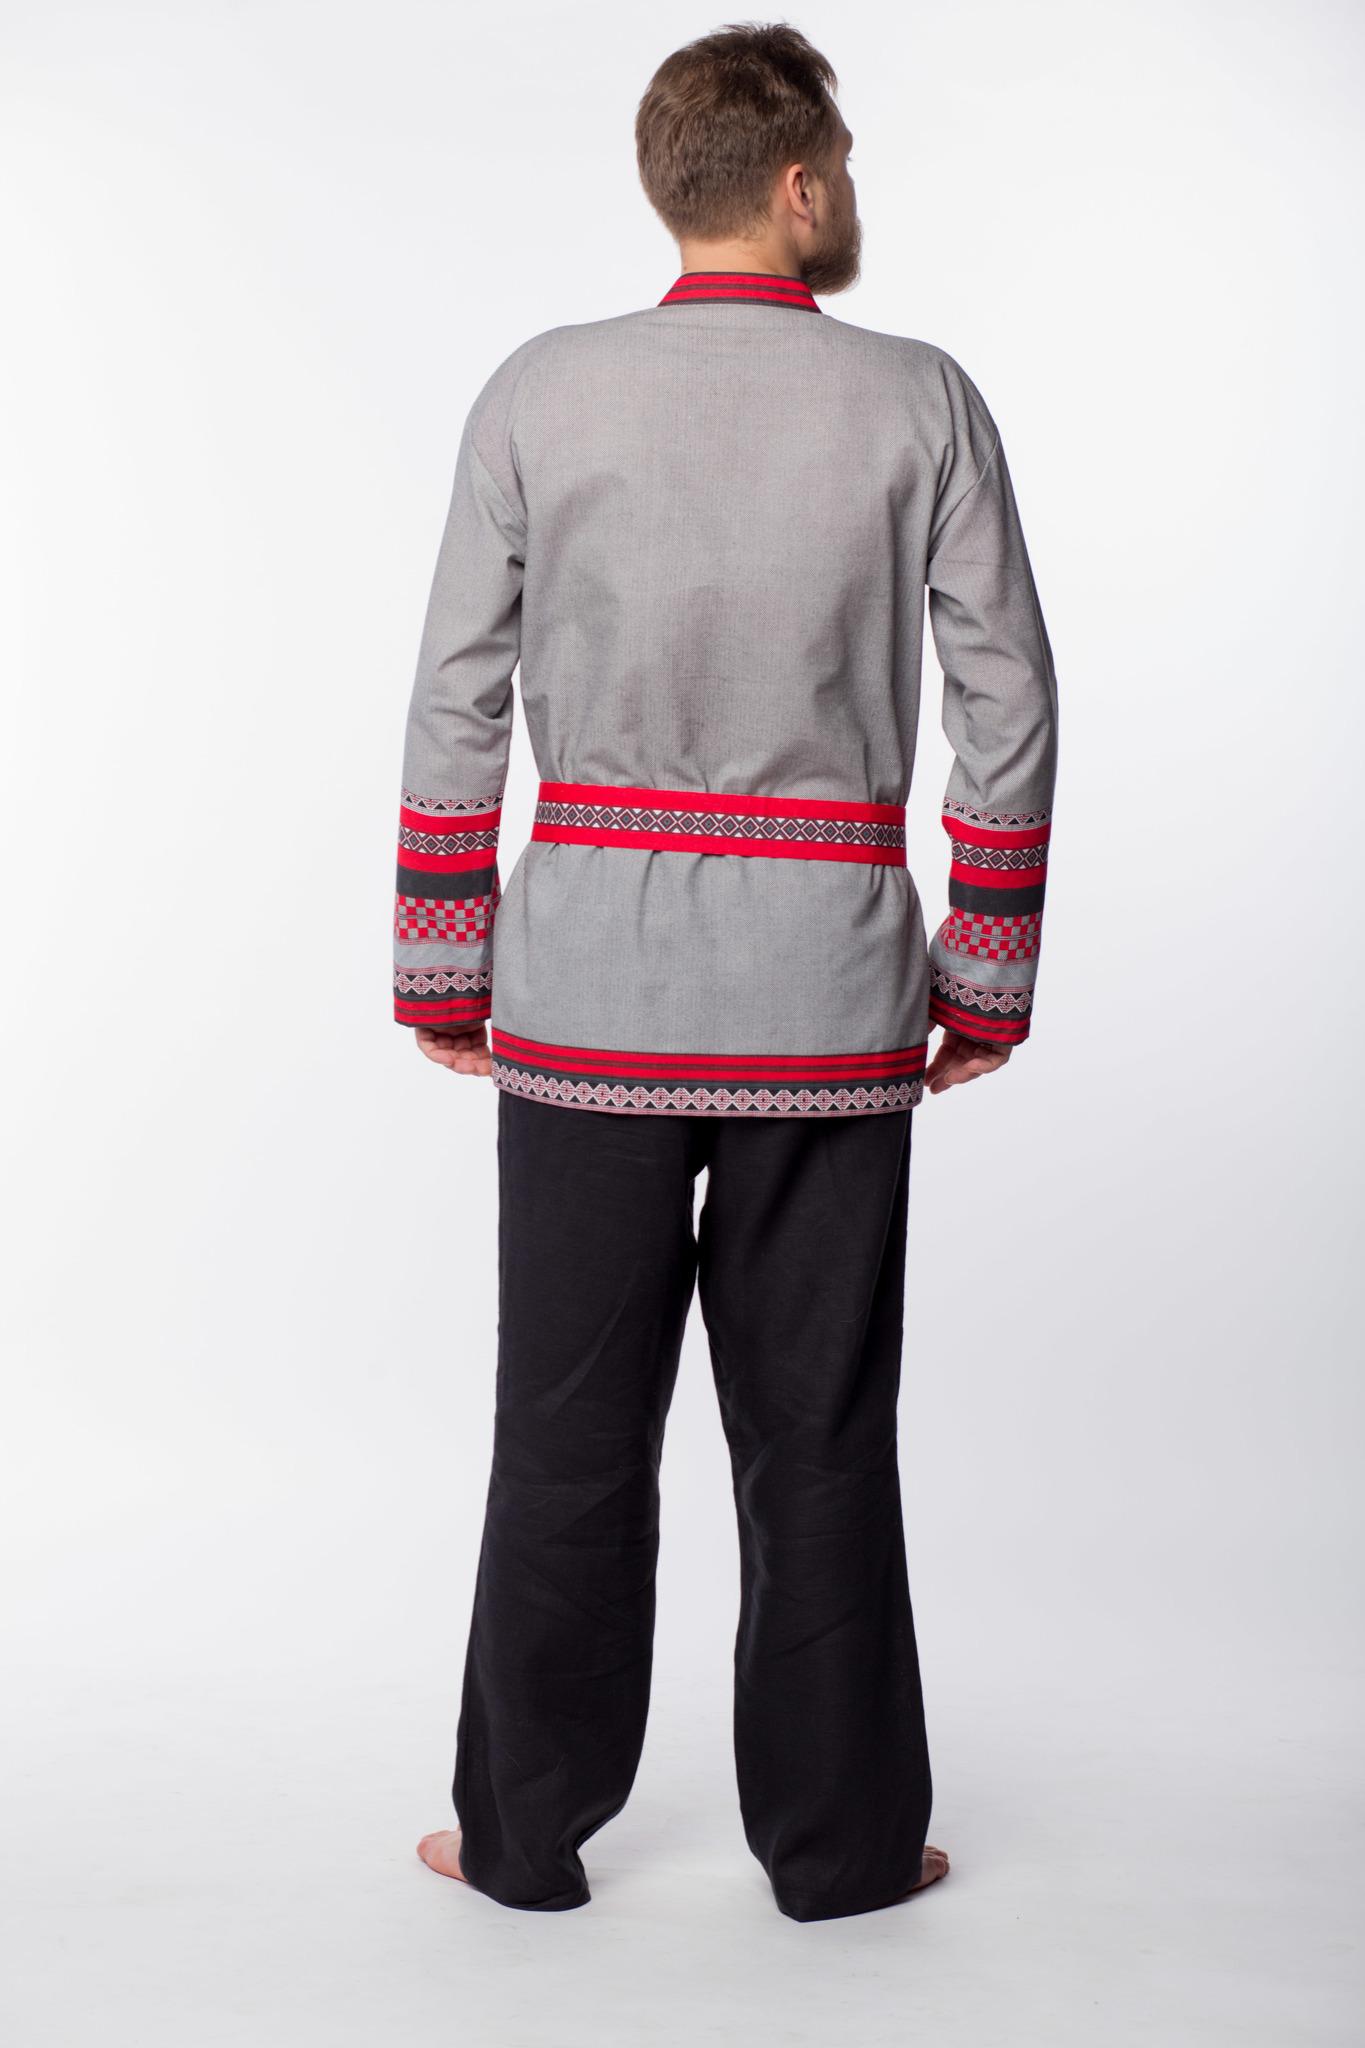 Мужская рубаха Чалдоны вид сзади